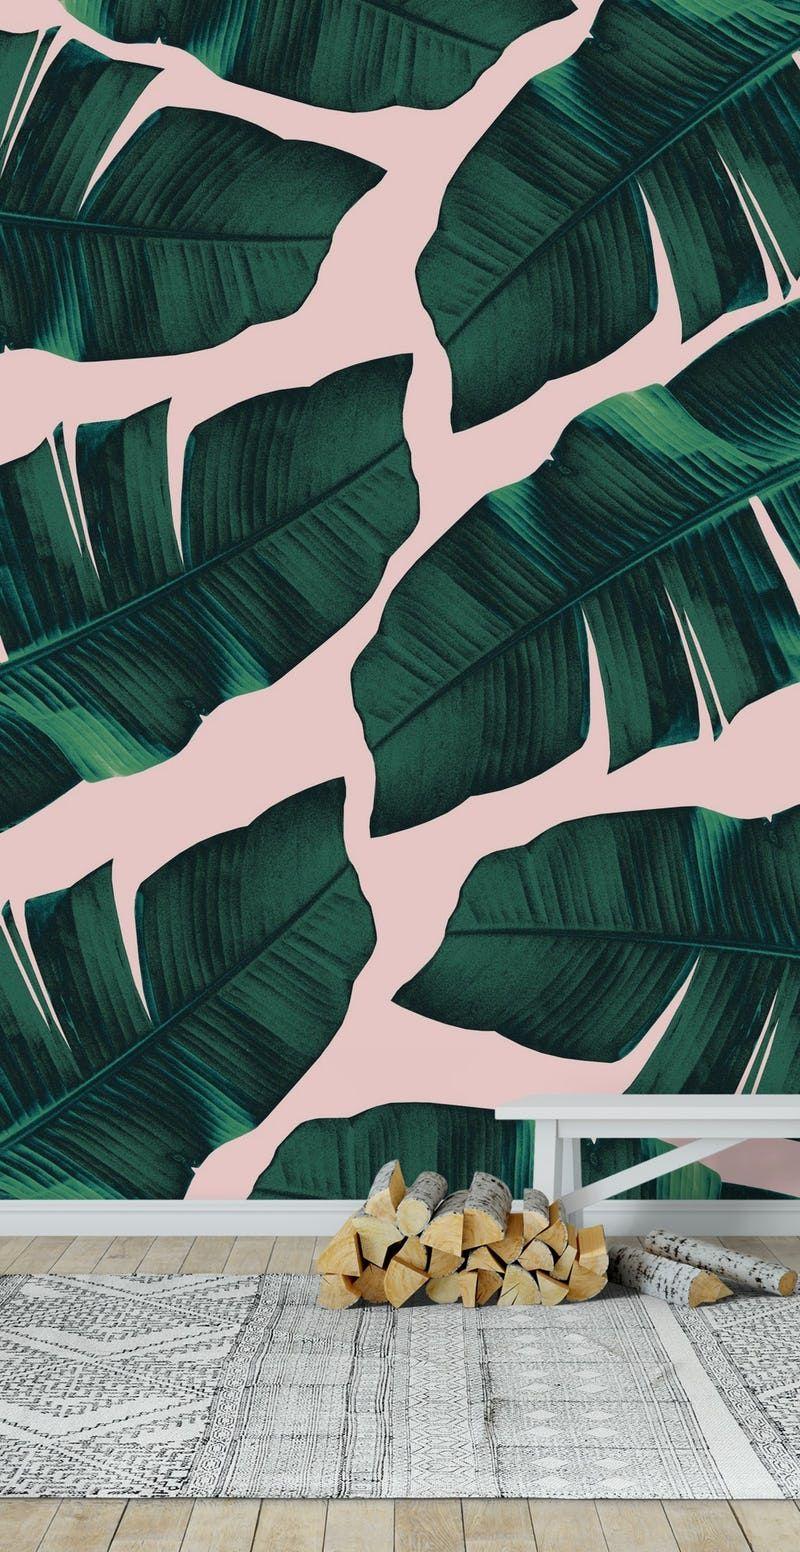 Blush Banana Leaves 2 Wallpaper From Happywall Com Banana Leaf Plant Wallpaper Banana Leaf Wallpaper